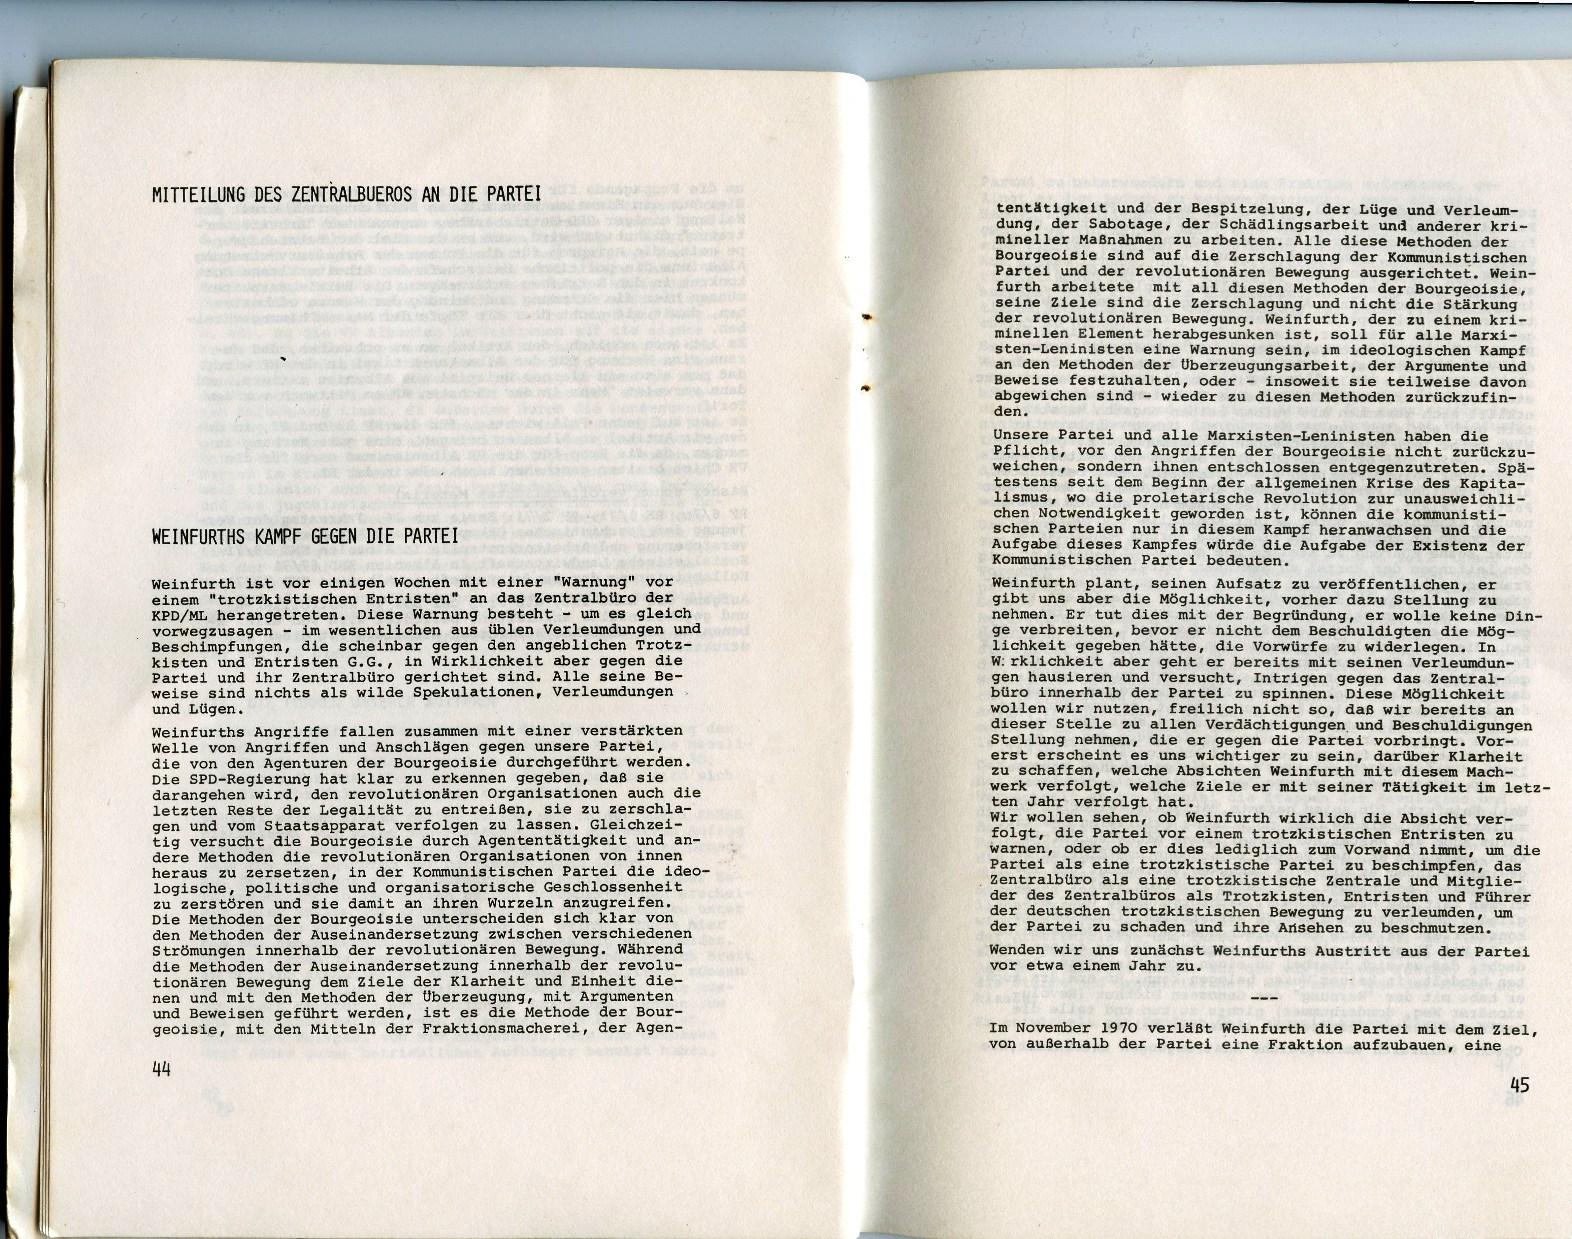 ZB_Parteiarbeiter_1971_09_23